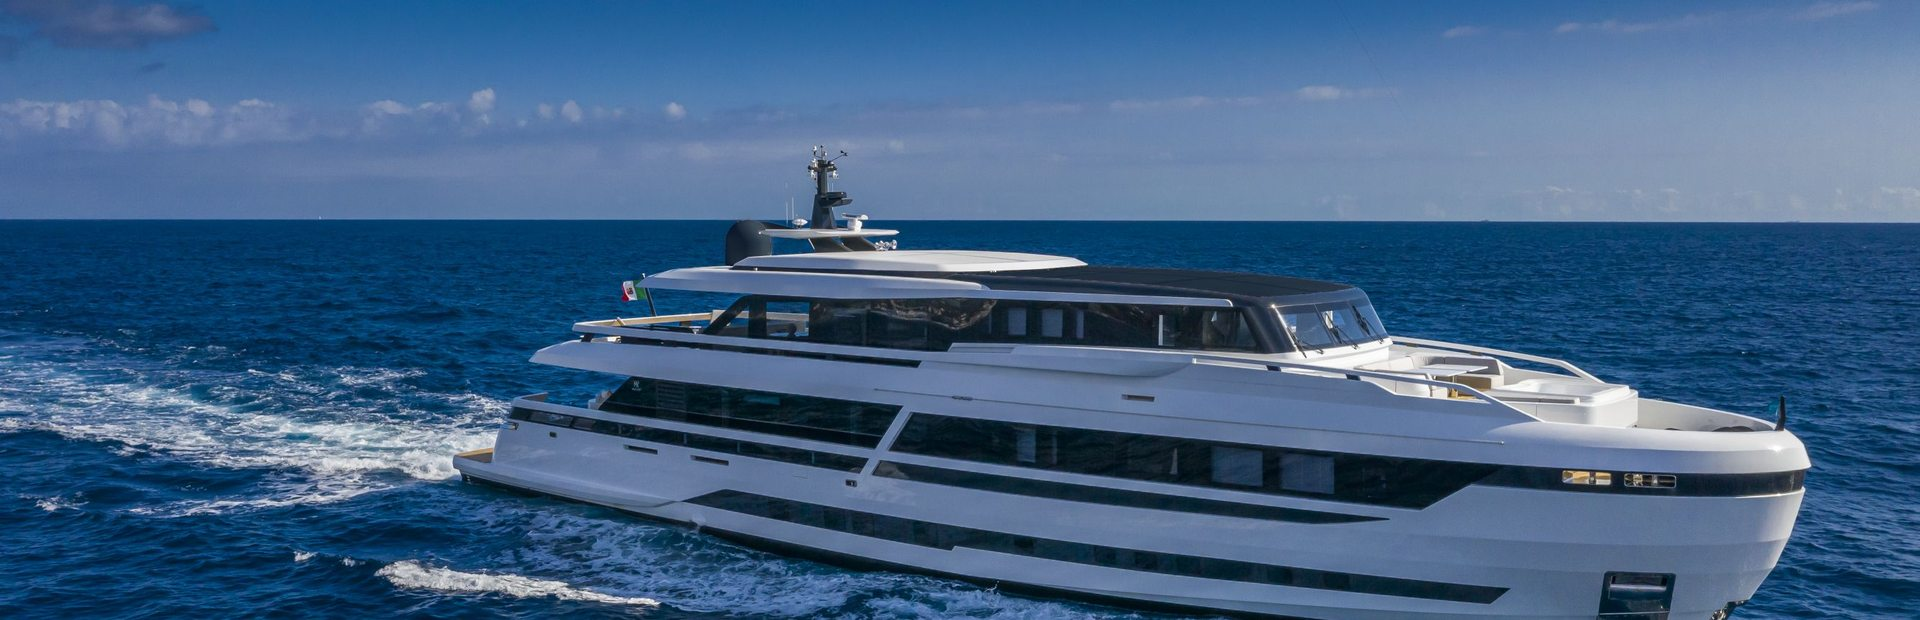 130 Alloy Yacht Charter